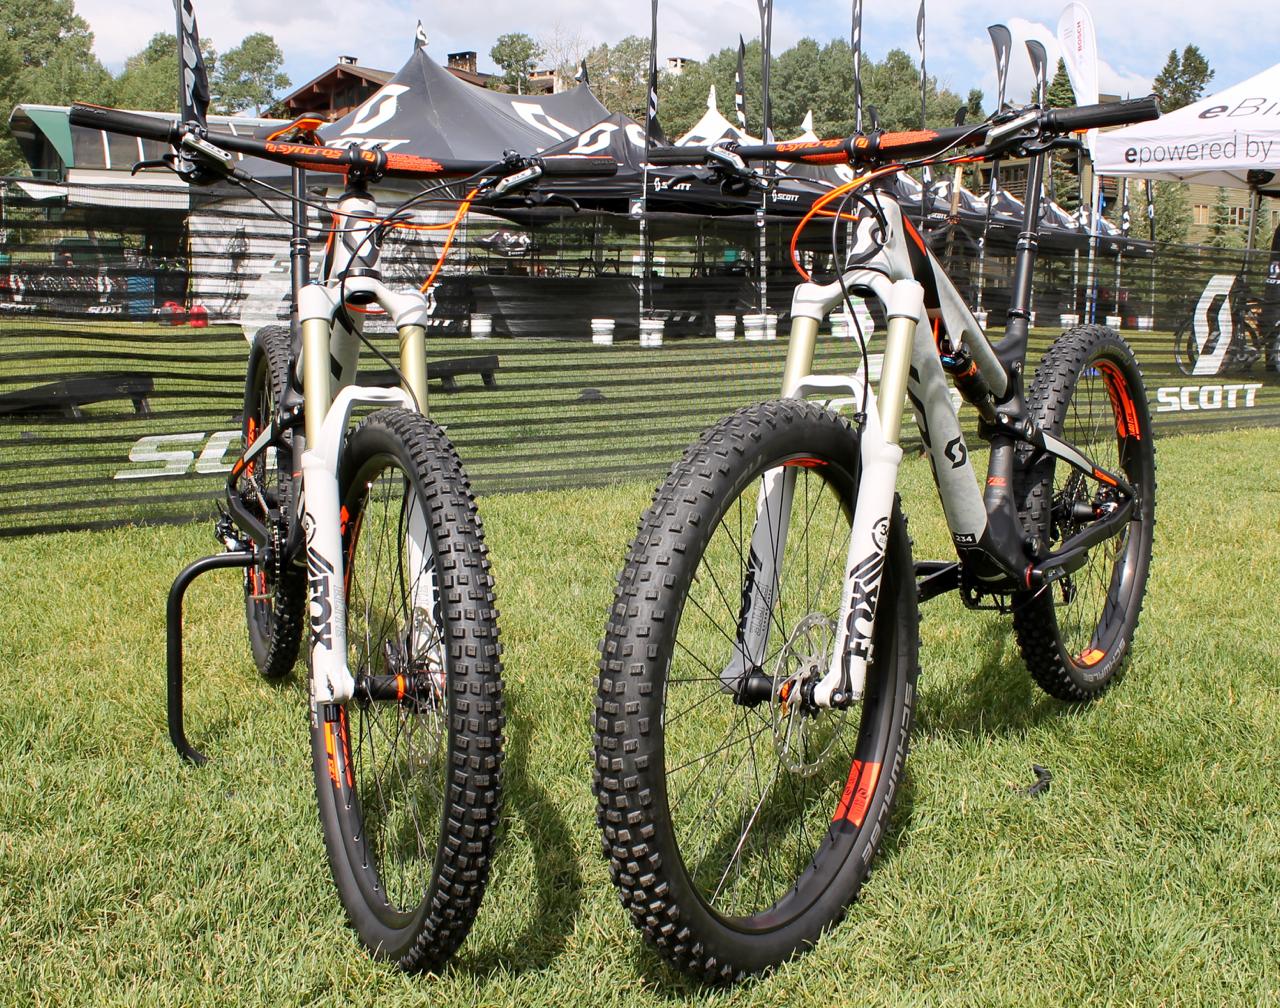 Plus Size Wheels Vs Standard Wheels The Real Scoop On